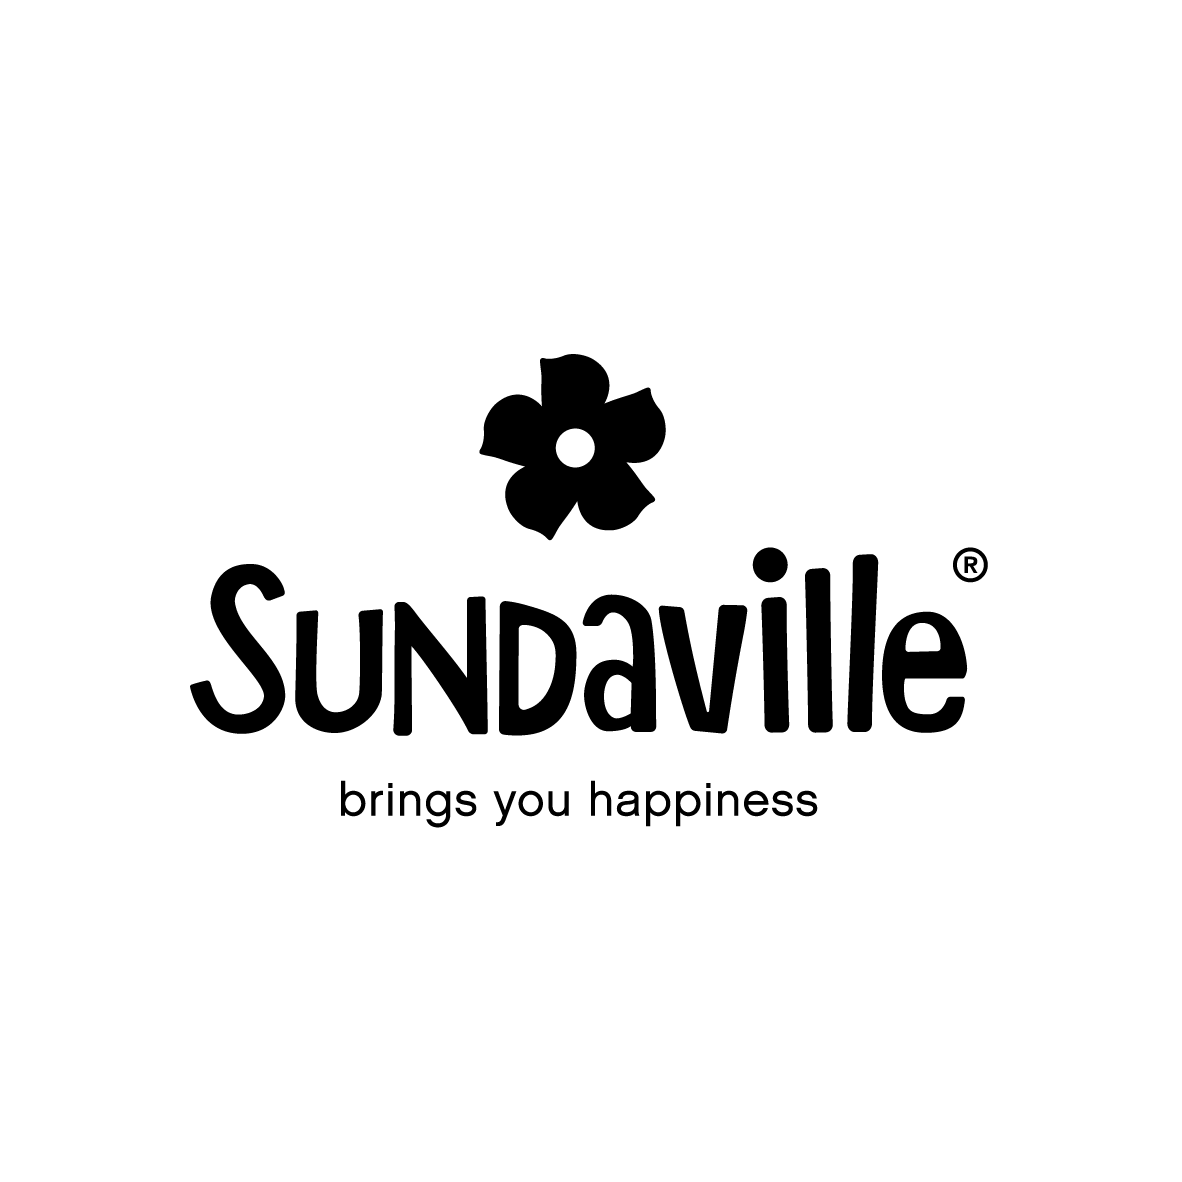 Sundaville logo black